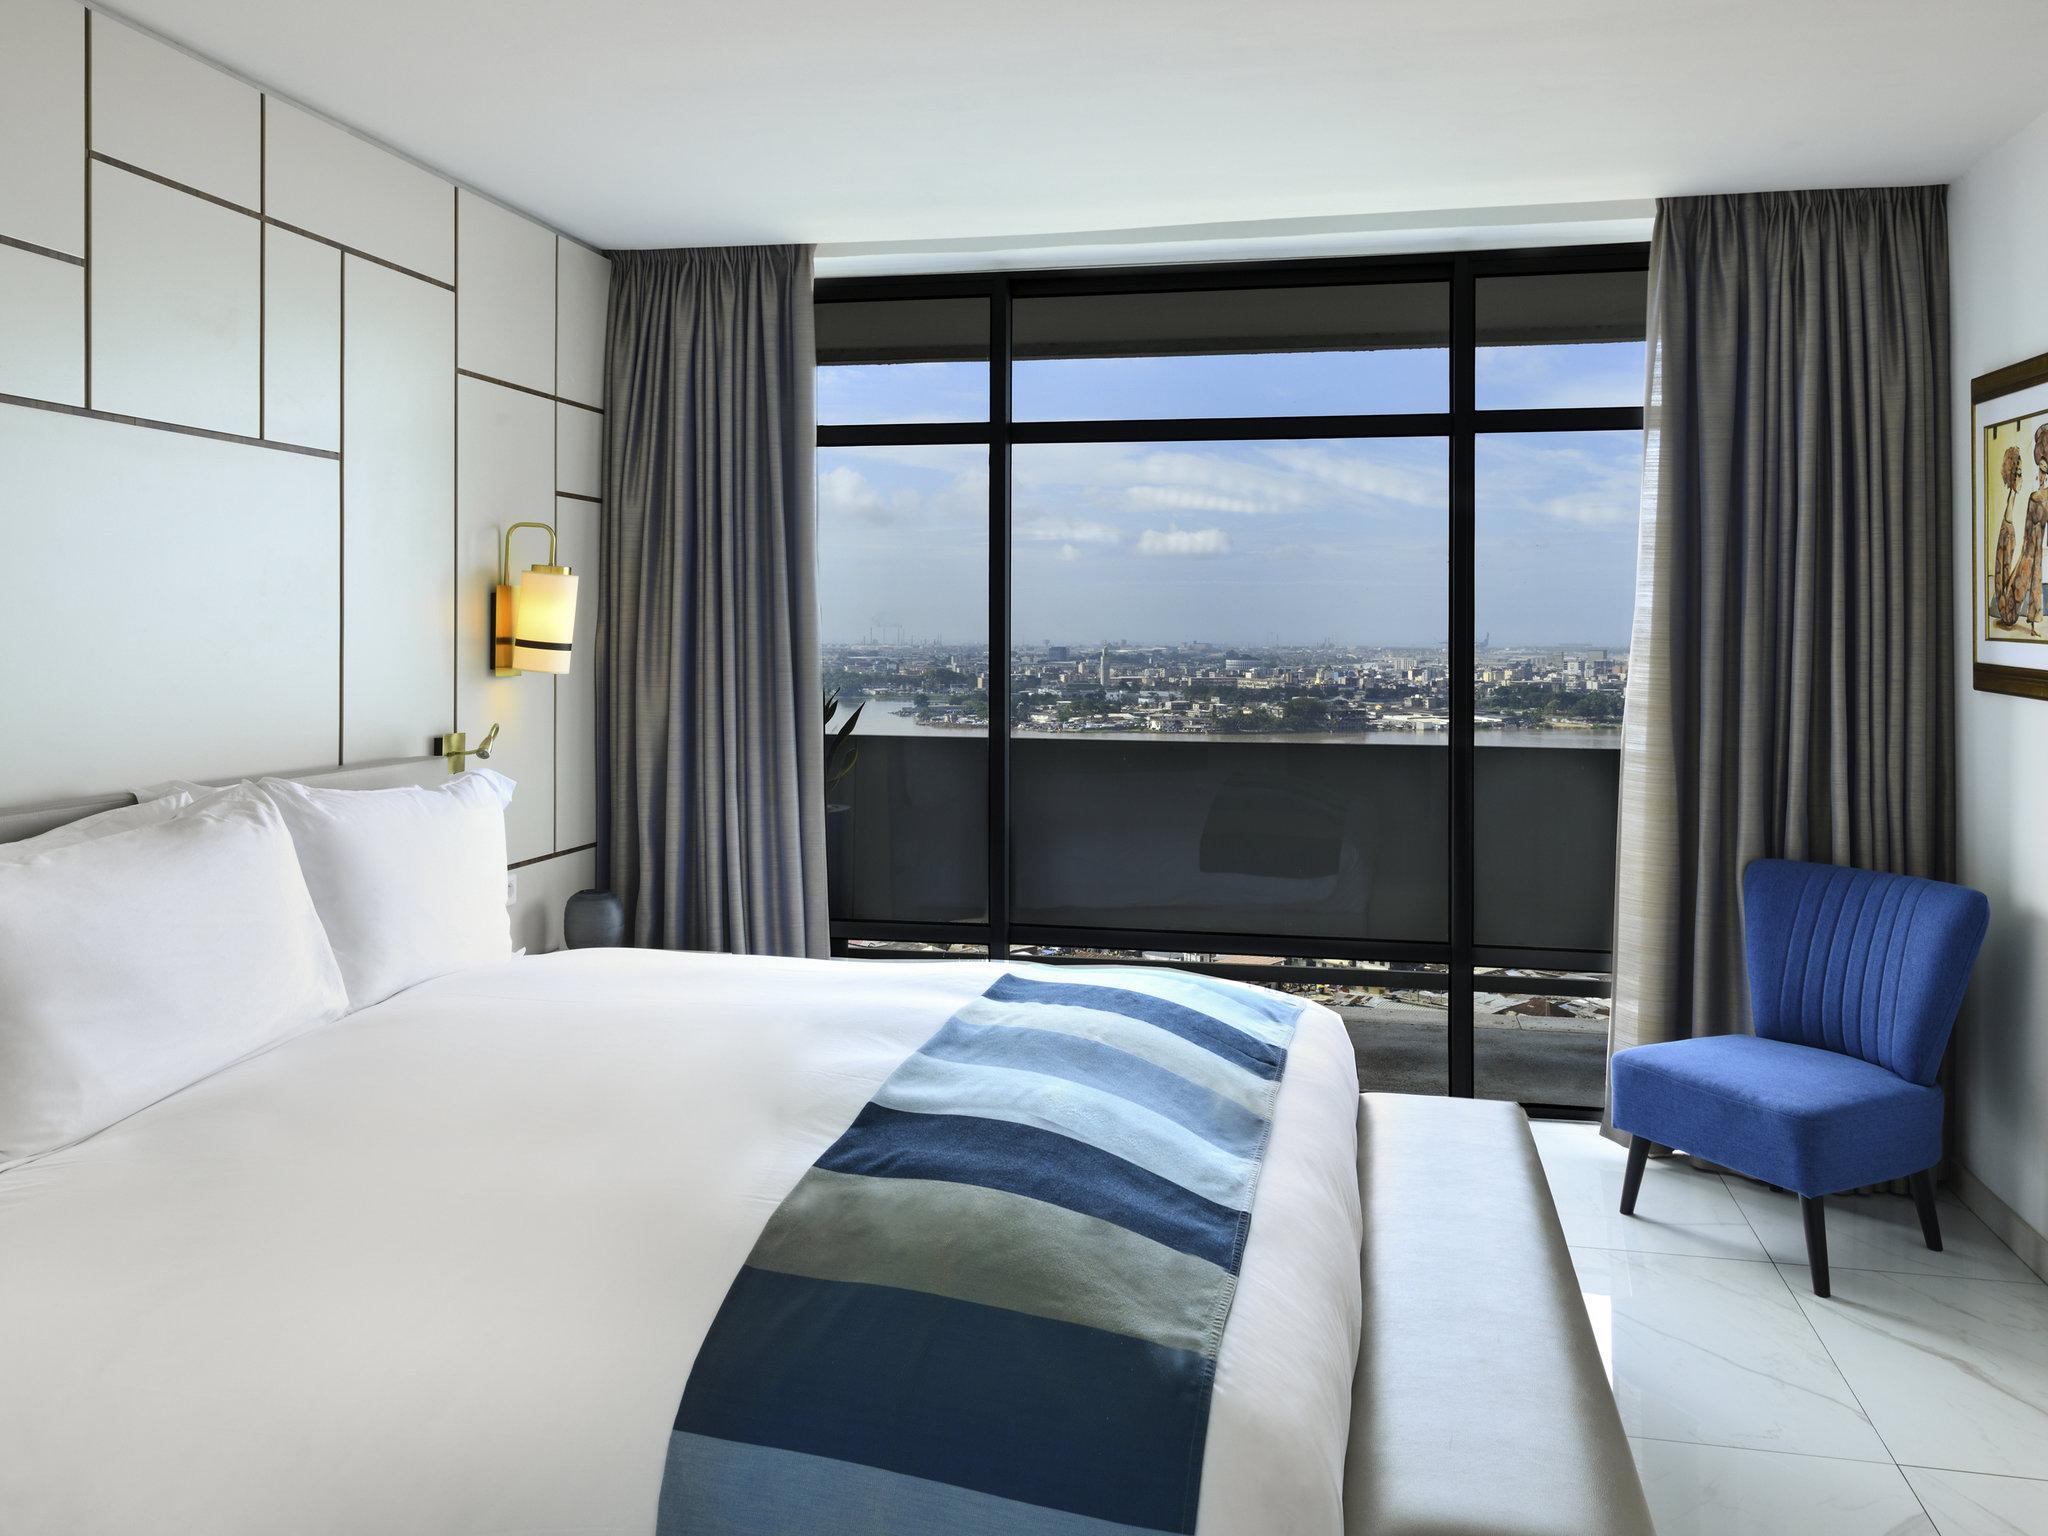 Hotel – Sofitel Abidjan Hôtel Ivoire